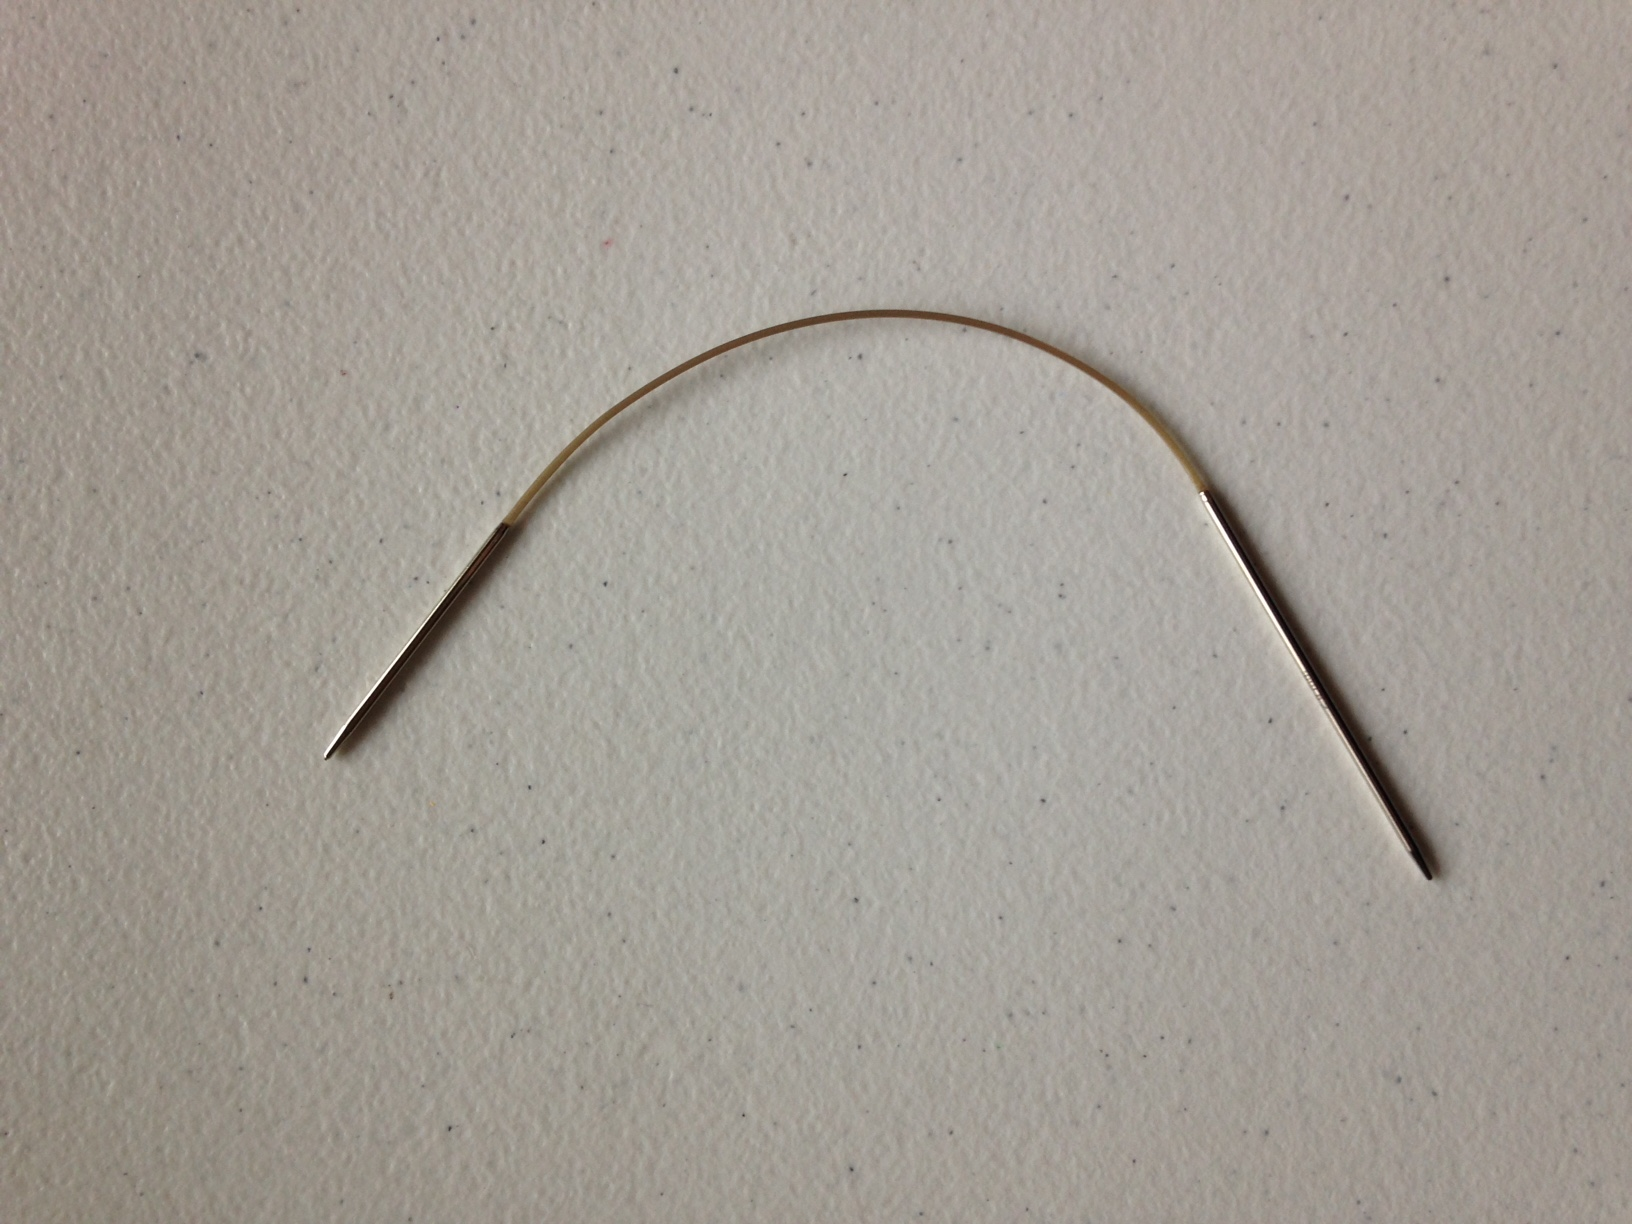 Circle Knitting Needles : Addi easyknit inch cm circular knitting needles